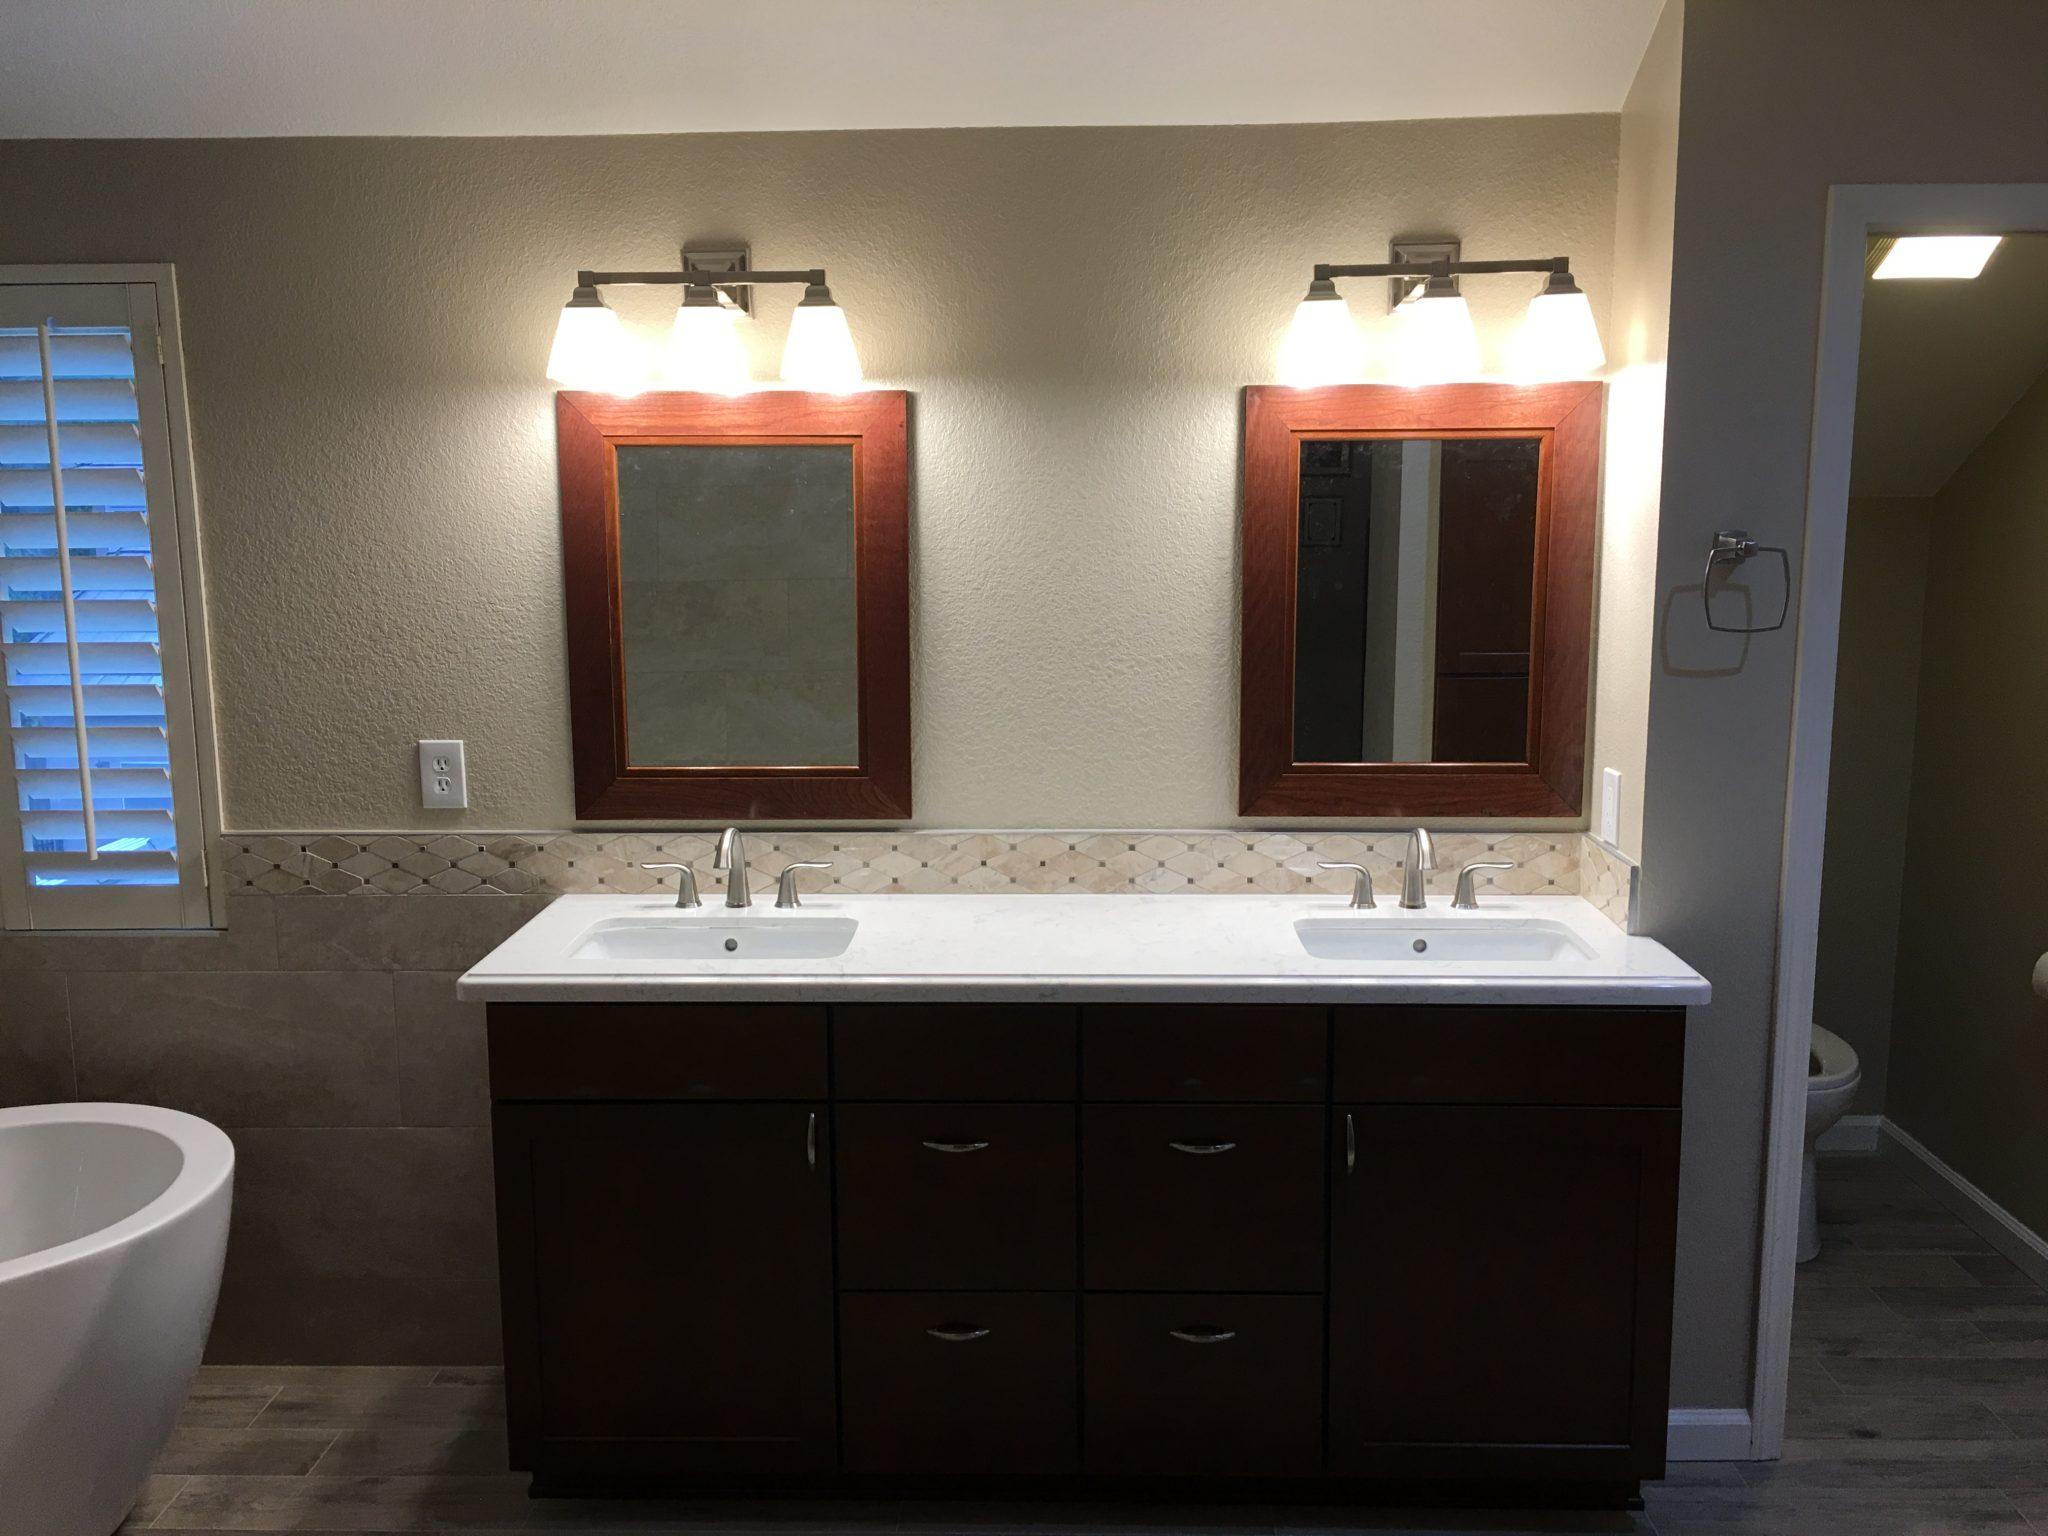 Bathroom Remodel Fair Oaks CA Amazing Home Builders - Bathroom remodel roseville ca